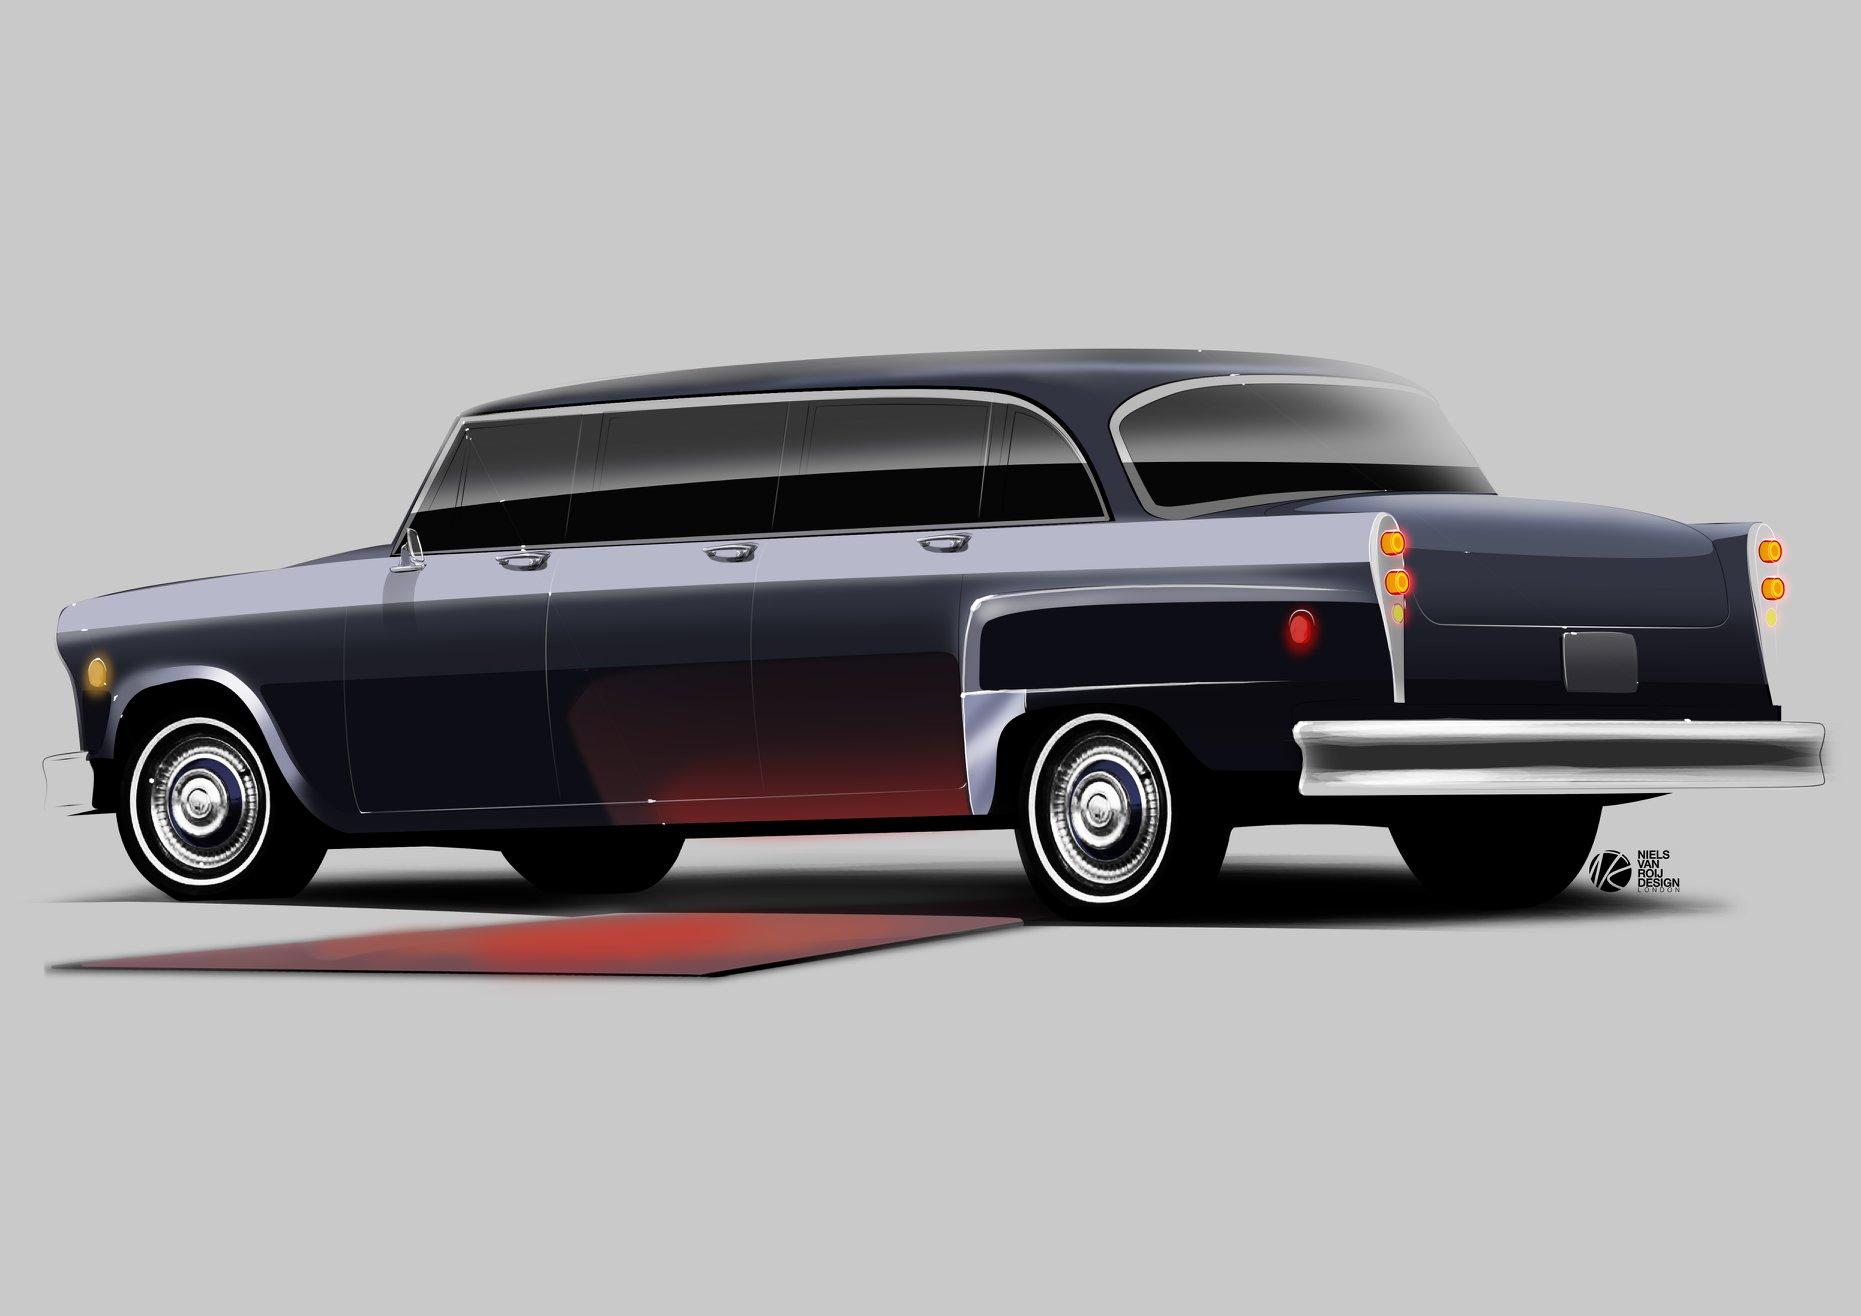 Vip-car-2